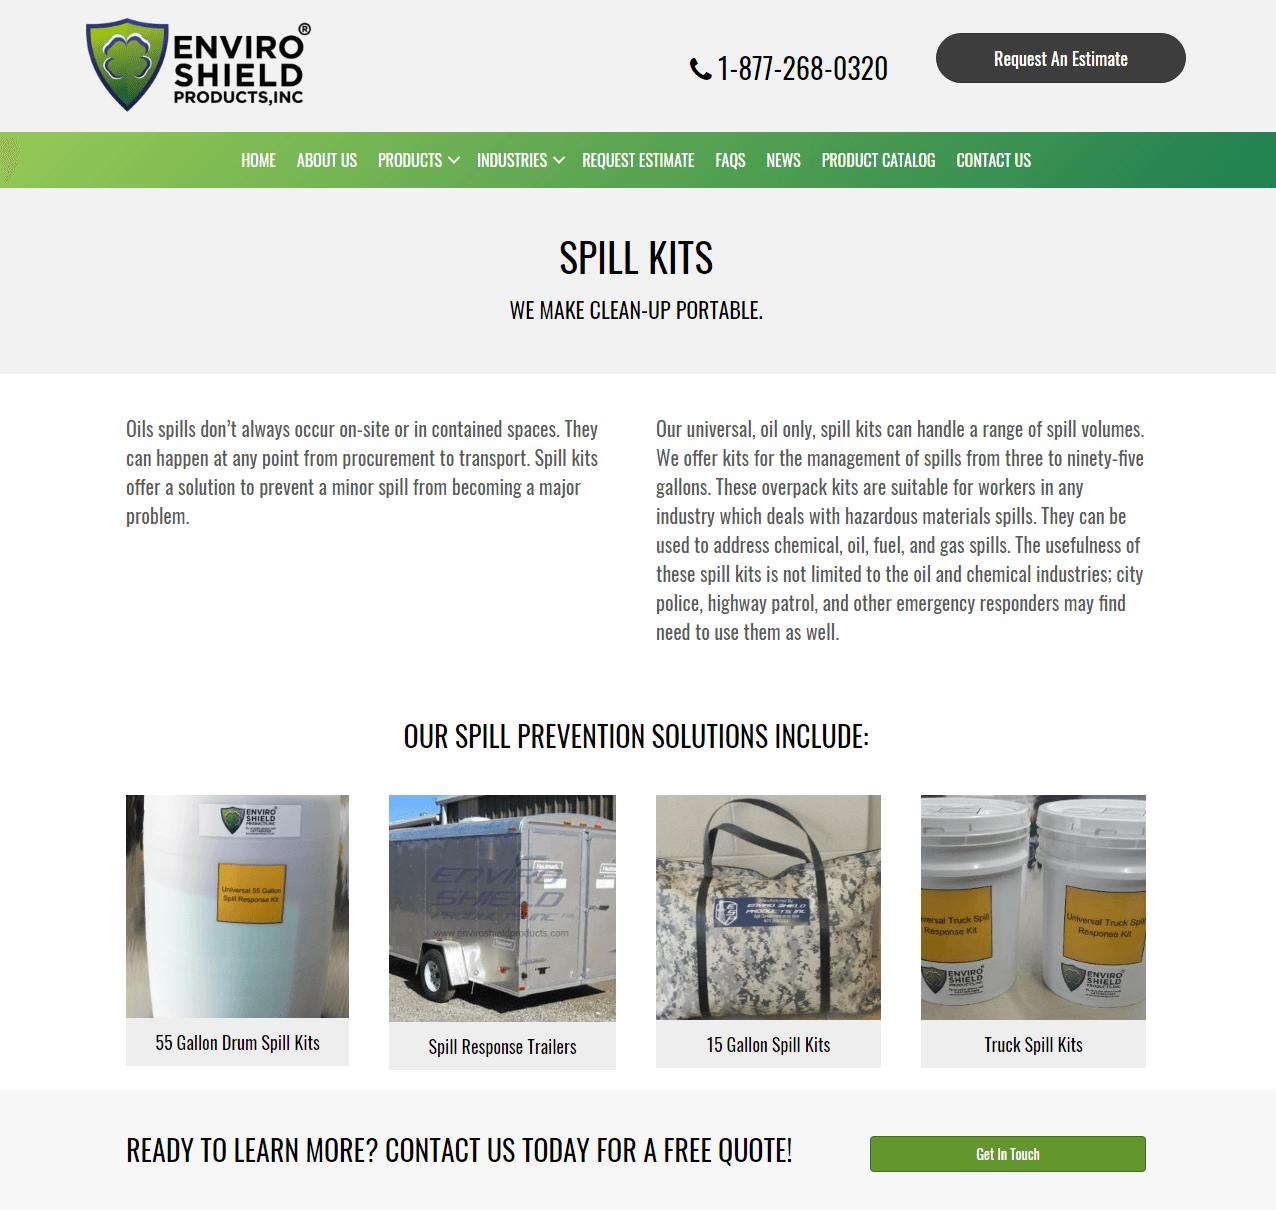 enviroshieldproducts-spill-kits